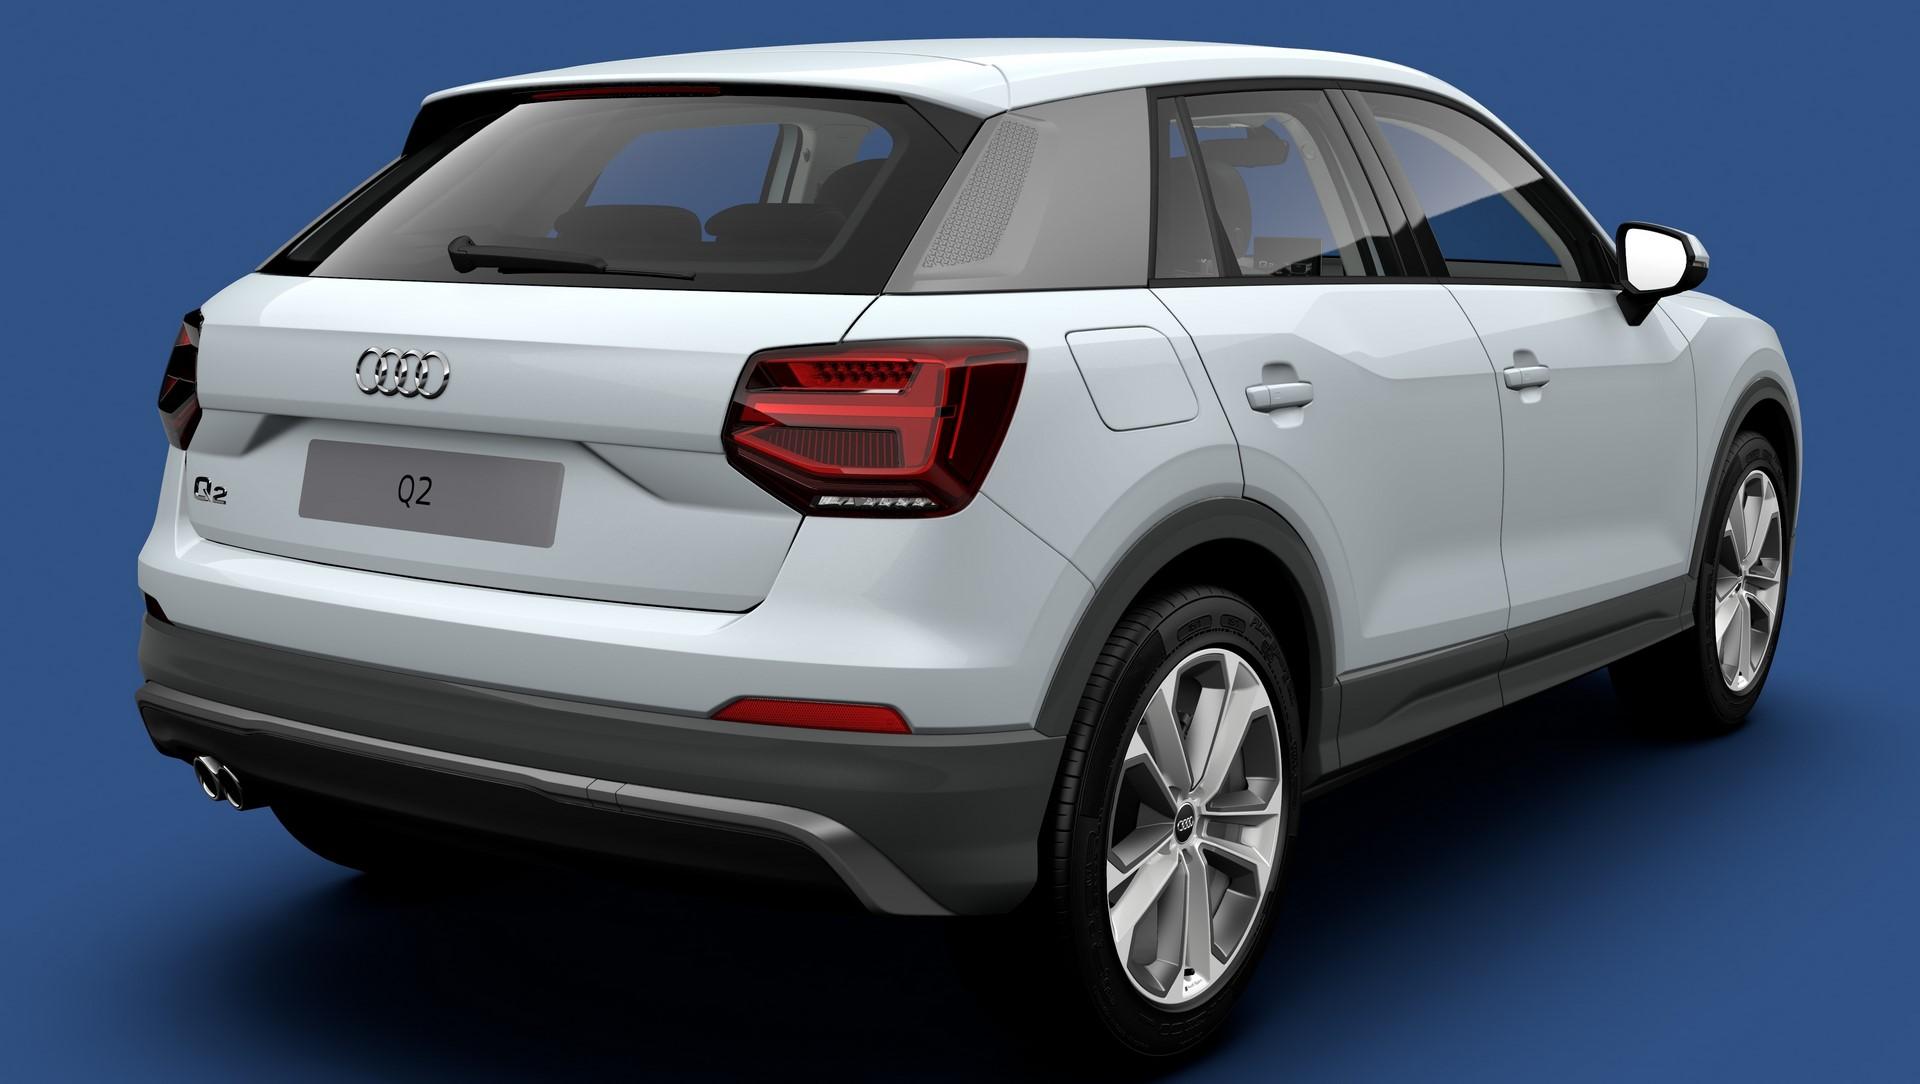 Audi puts partial matting into volume production